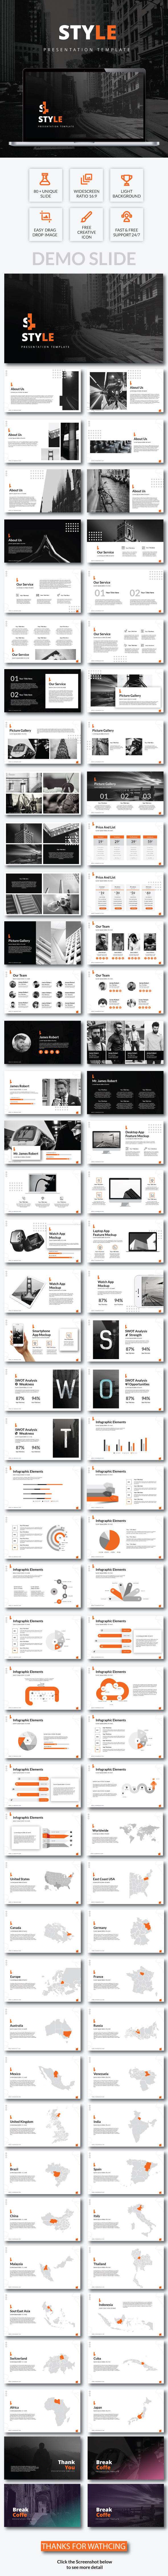 Style - Google Slide Template - Google Slides Presentation Templates